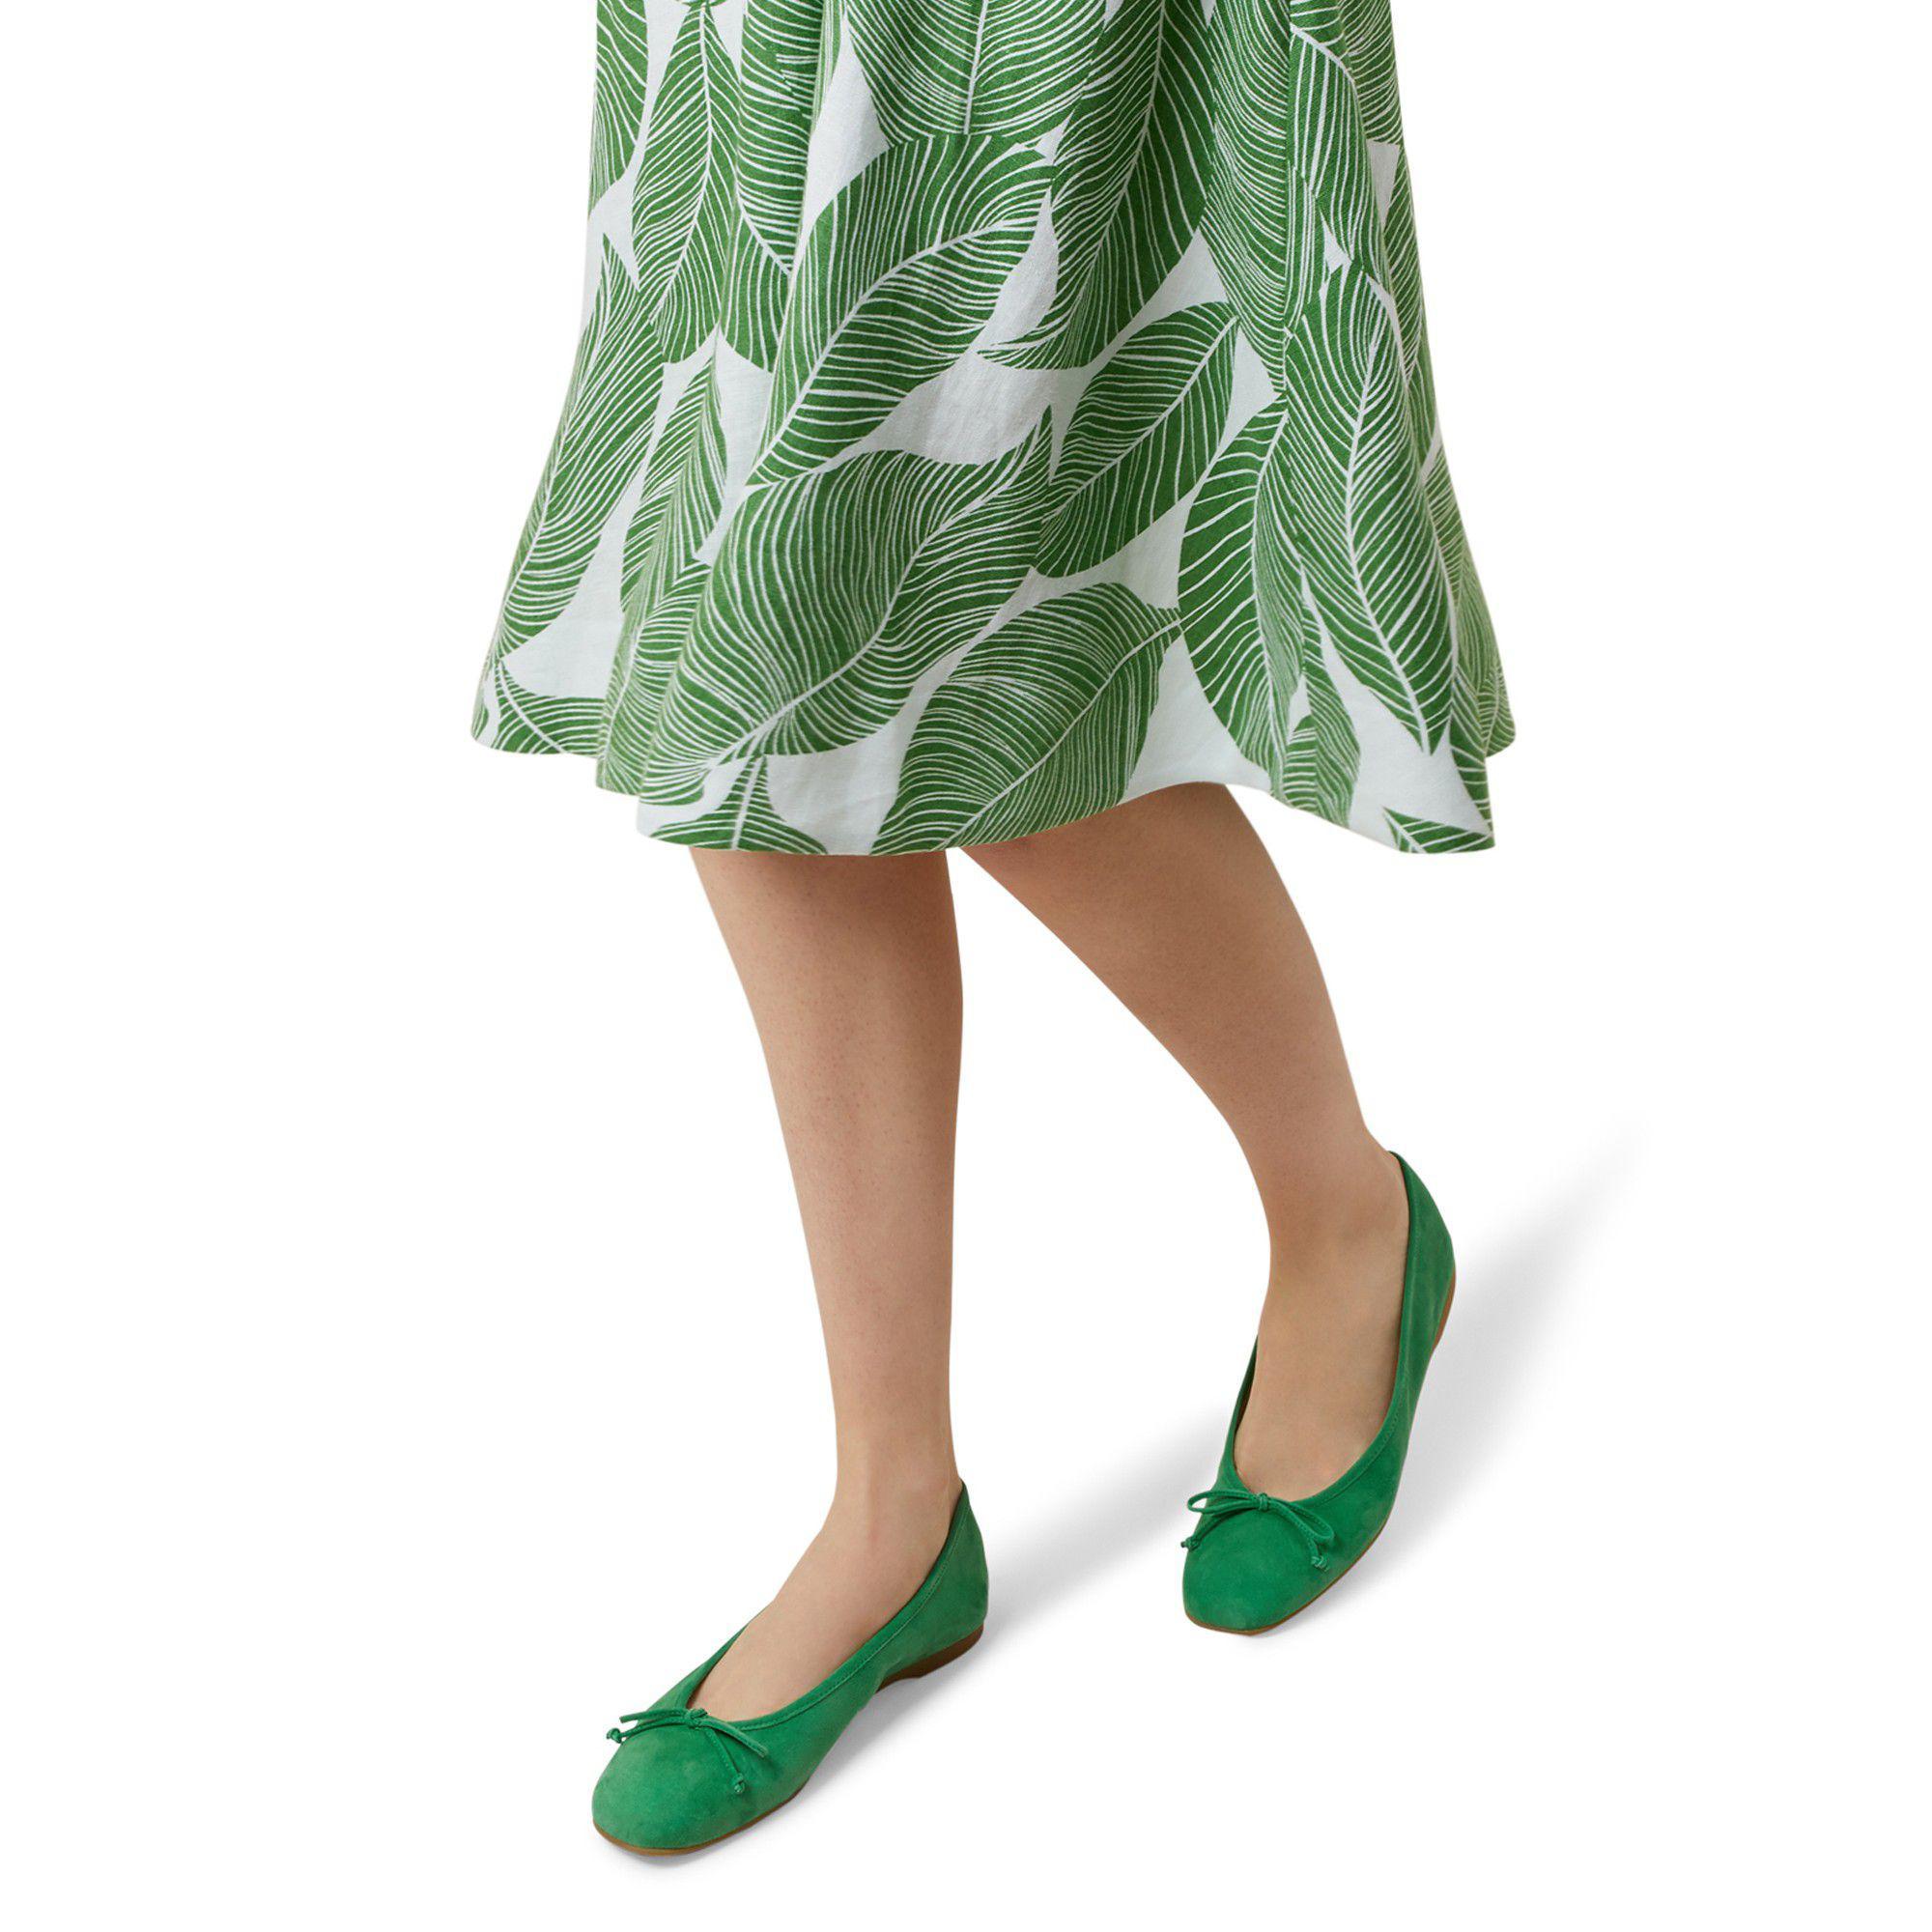 d72011f15bf Hobbs - Bright Green  prior  Ballerina Shoes - Lyst. View fullscreen